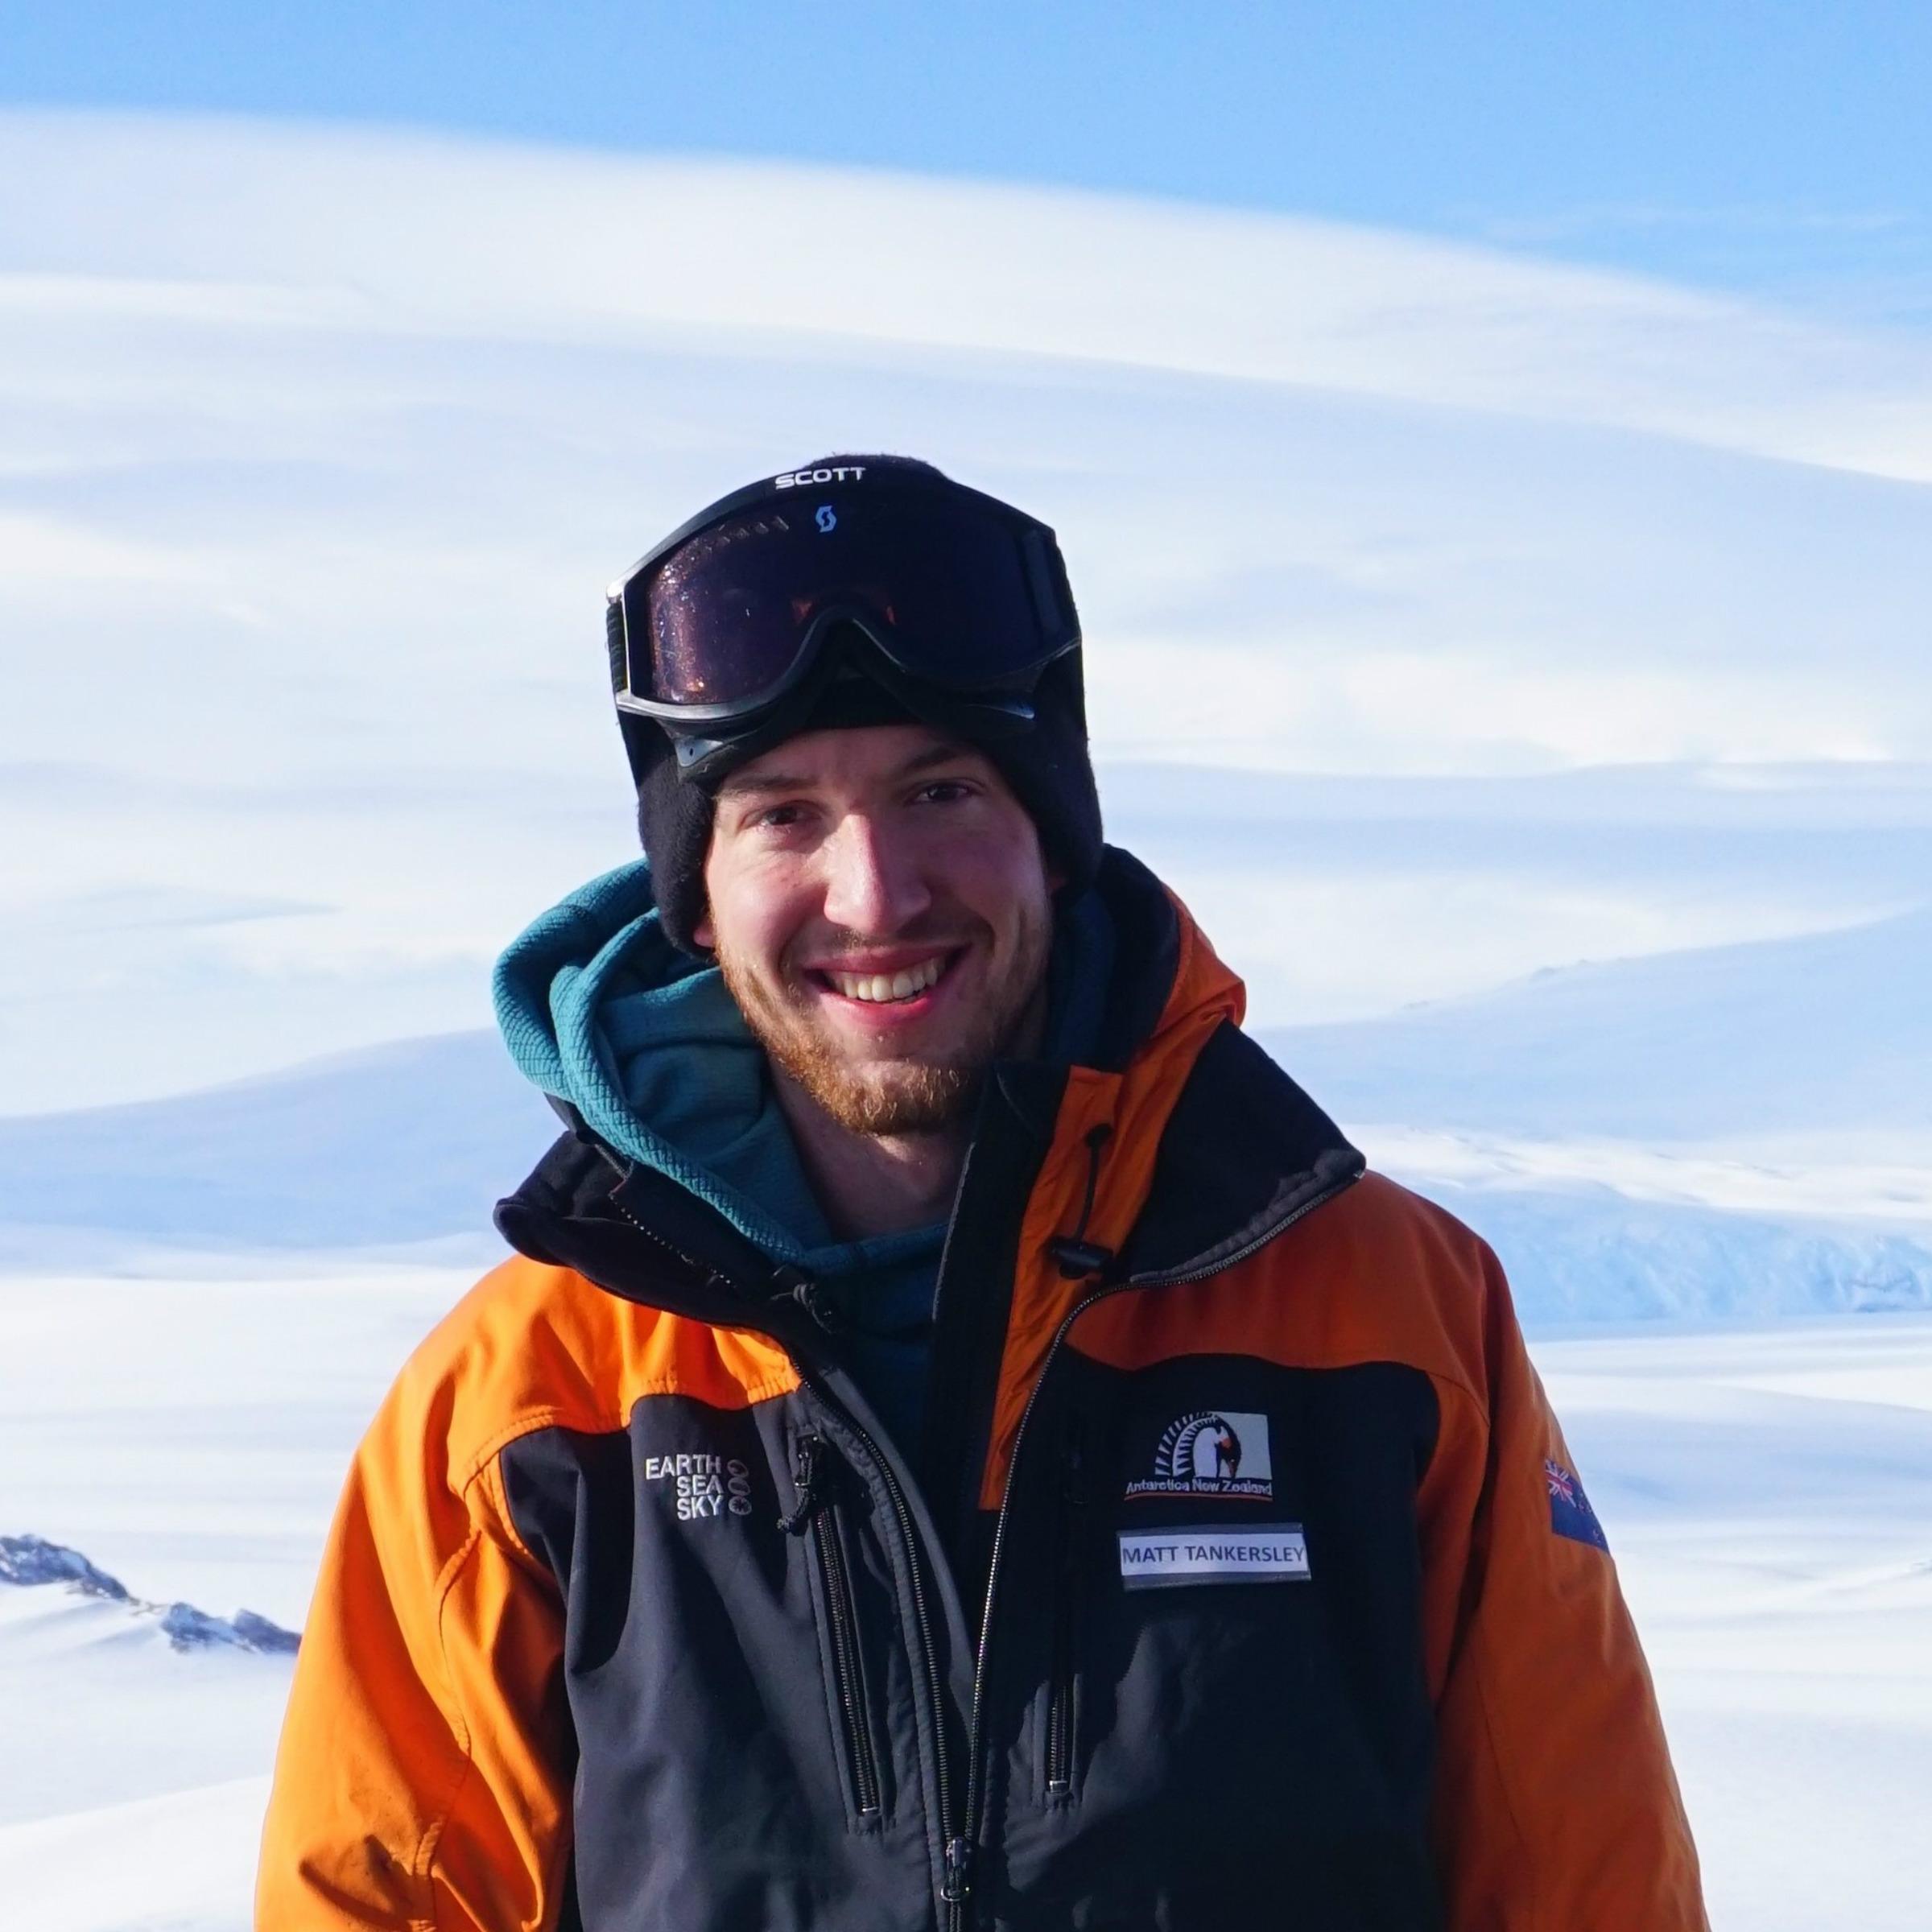 Matt Tankersley